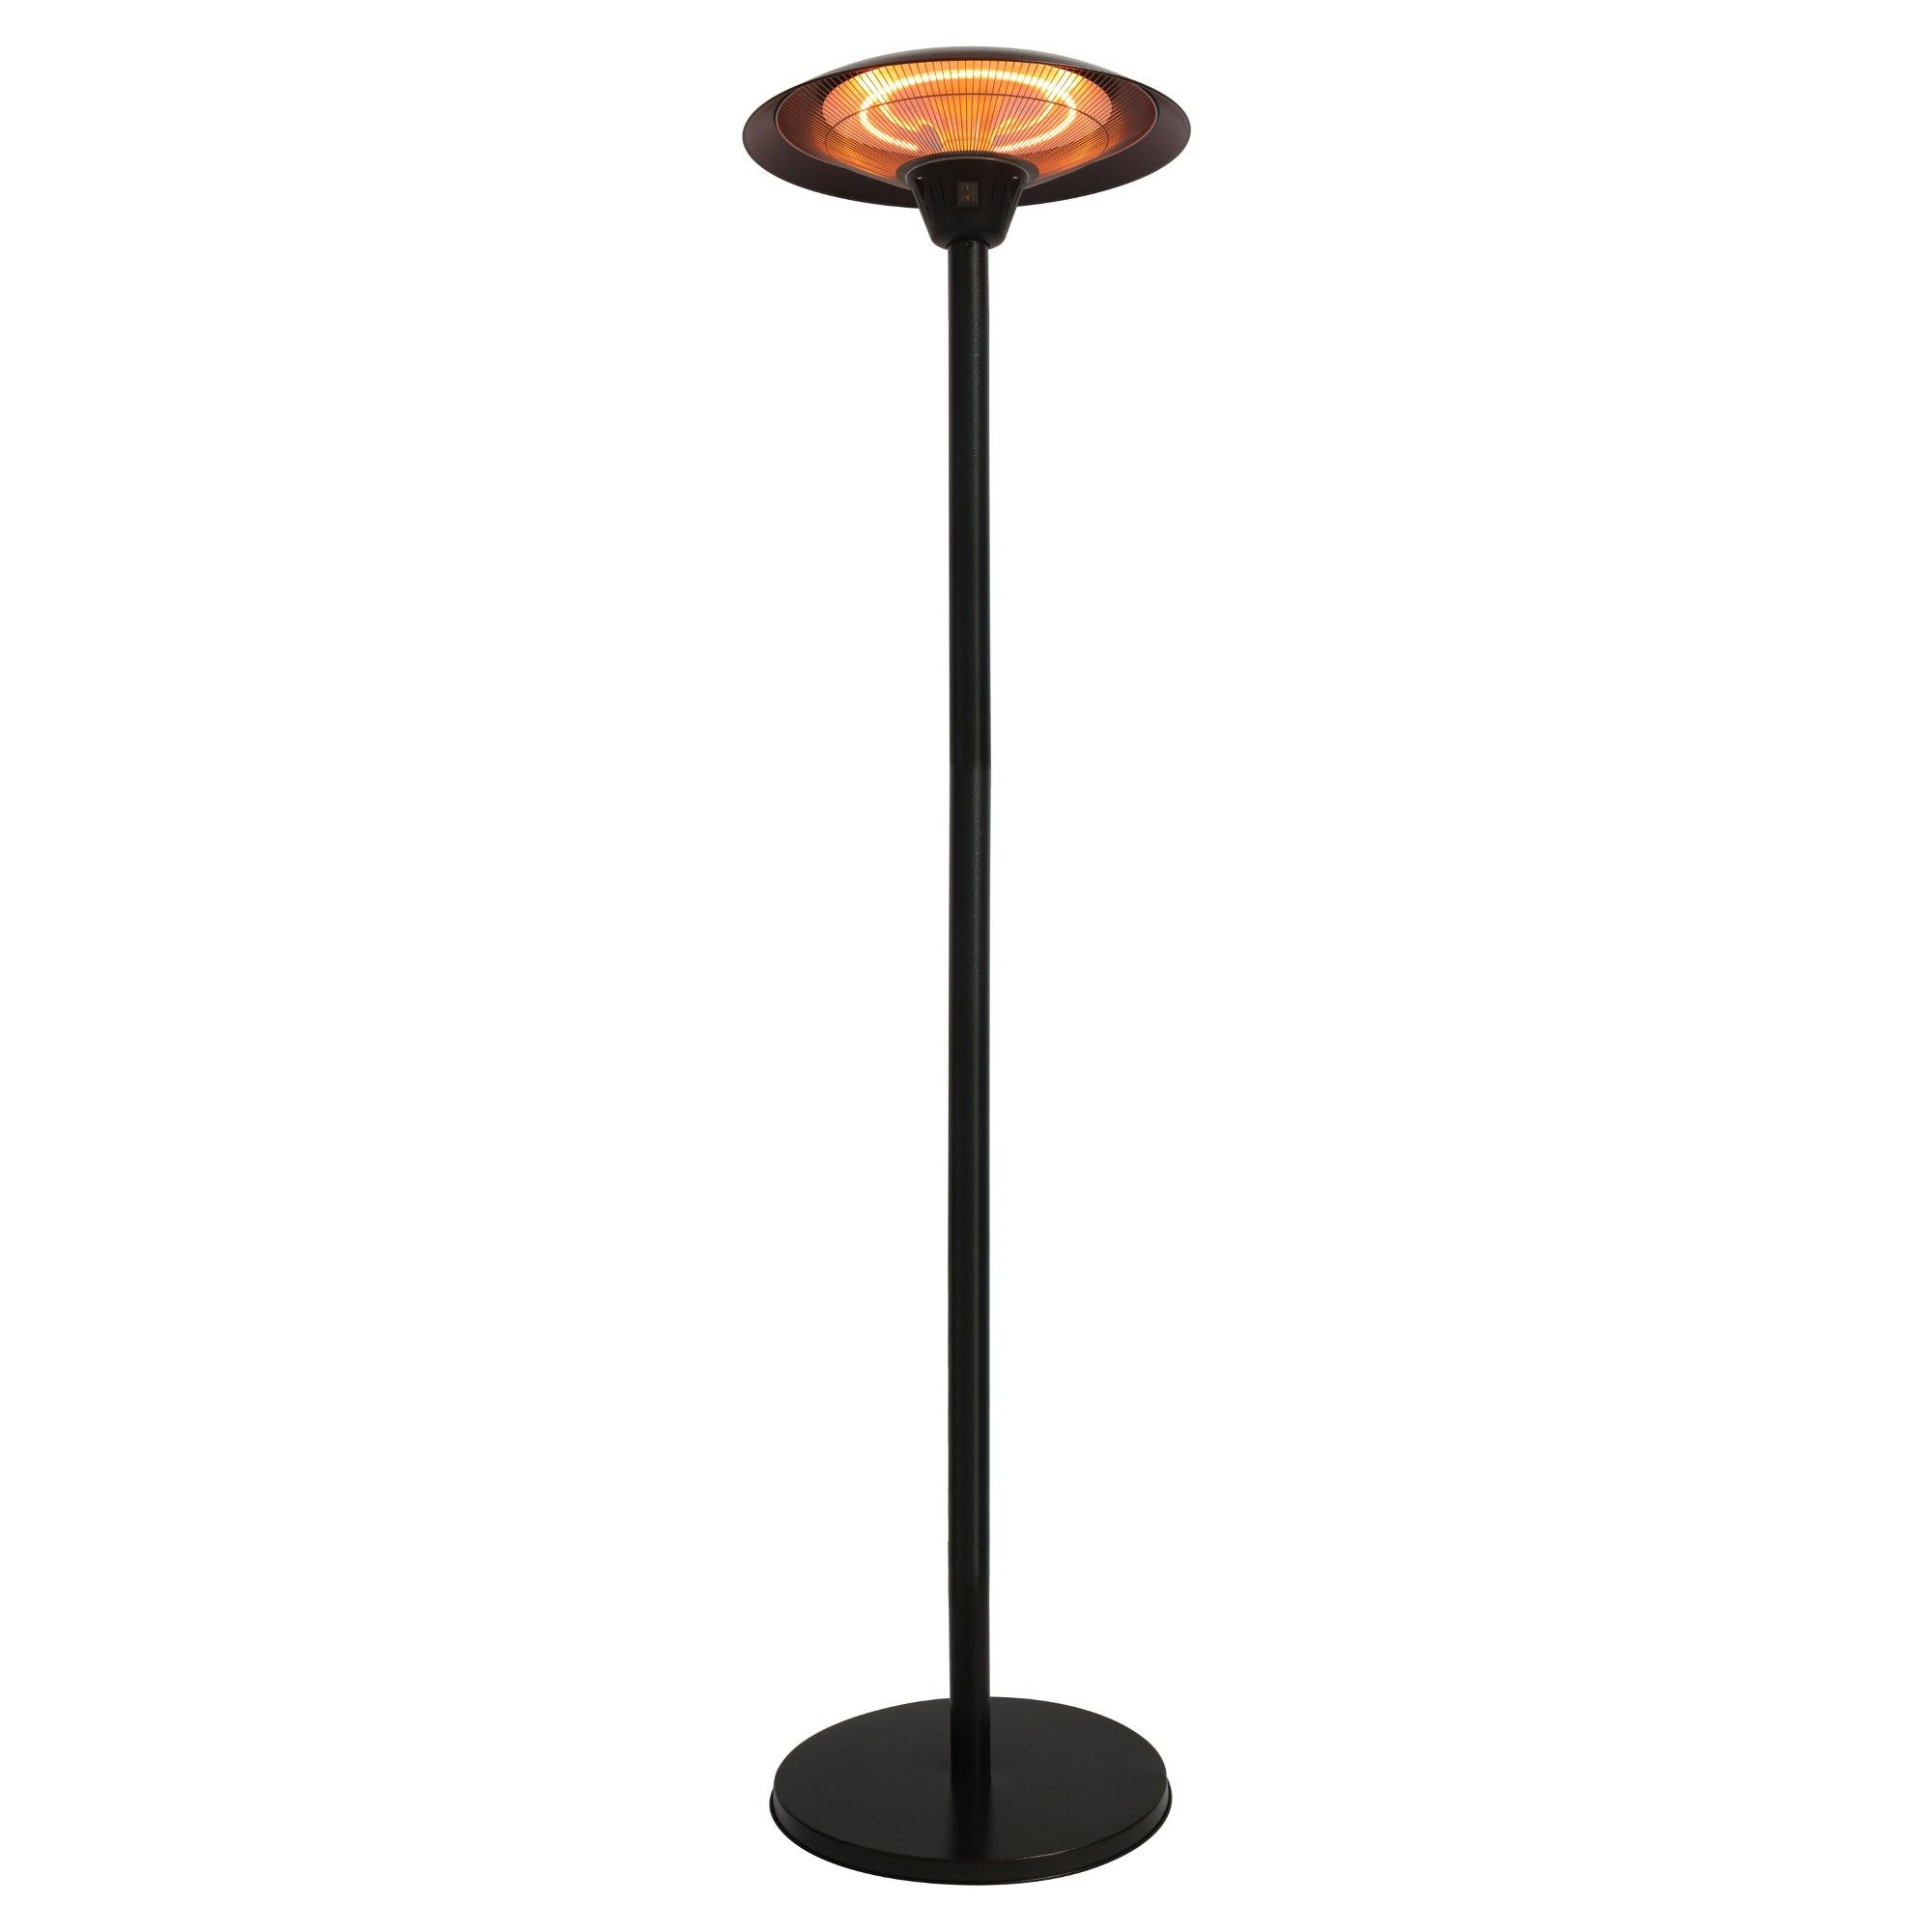 frisco colored halogen patio heater bronze fire sense products